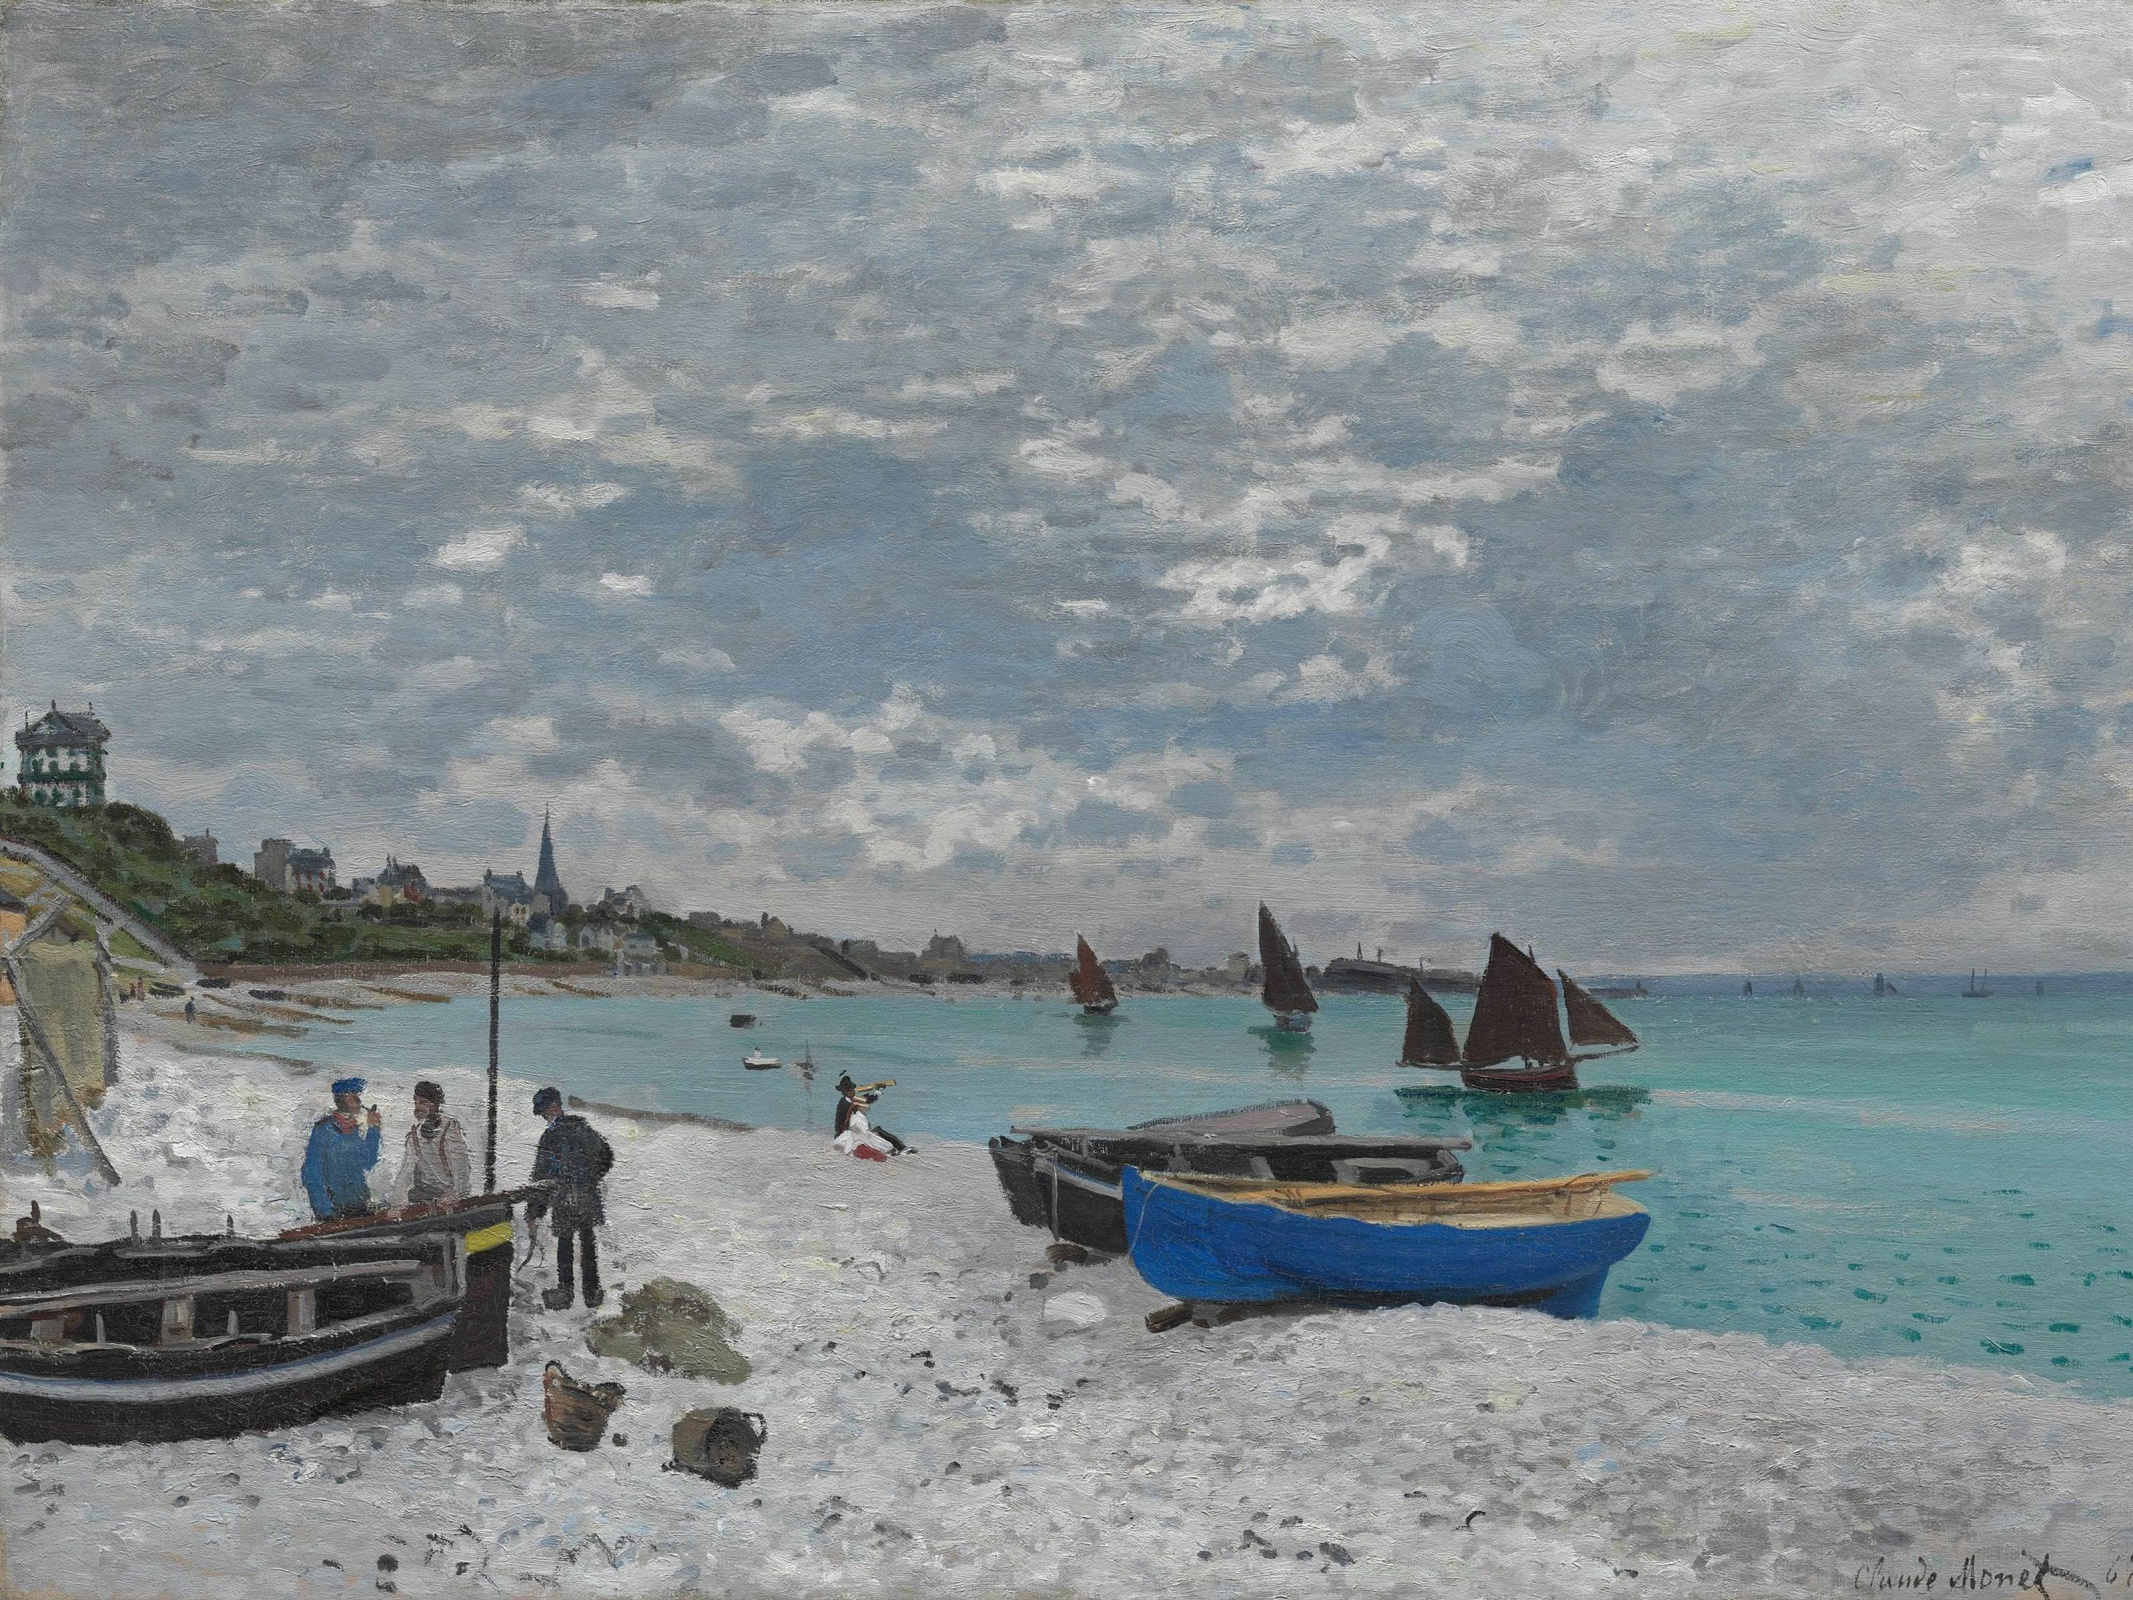 Claude Monet. The beach at Sainte-Adresse